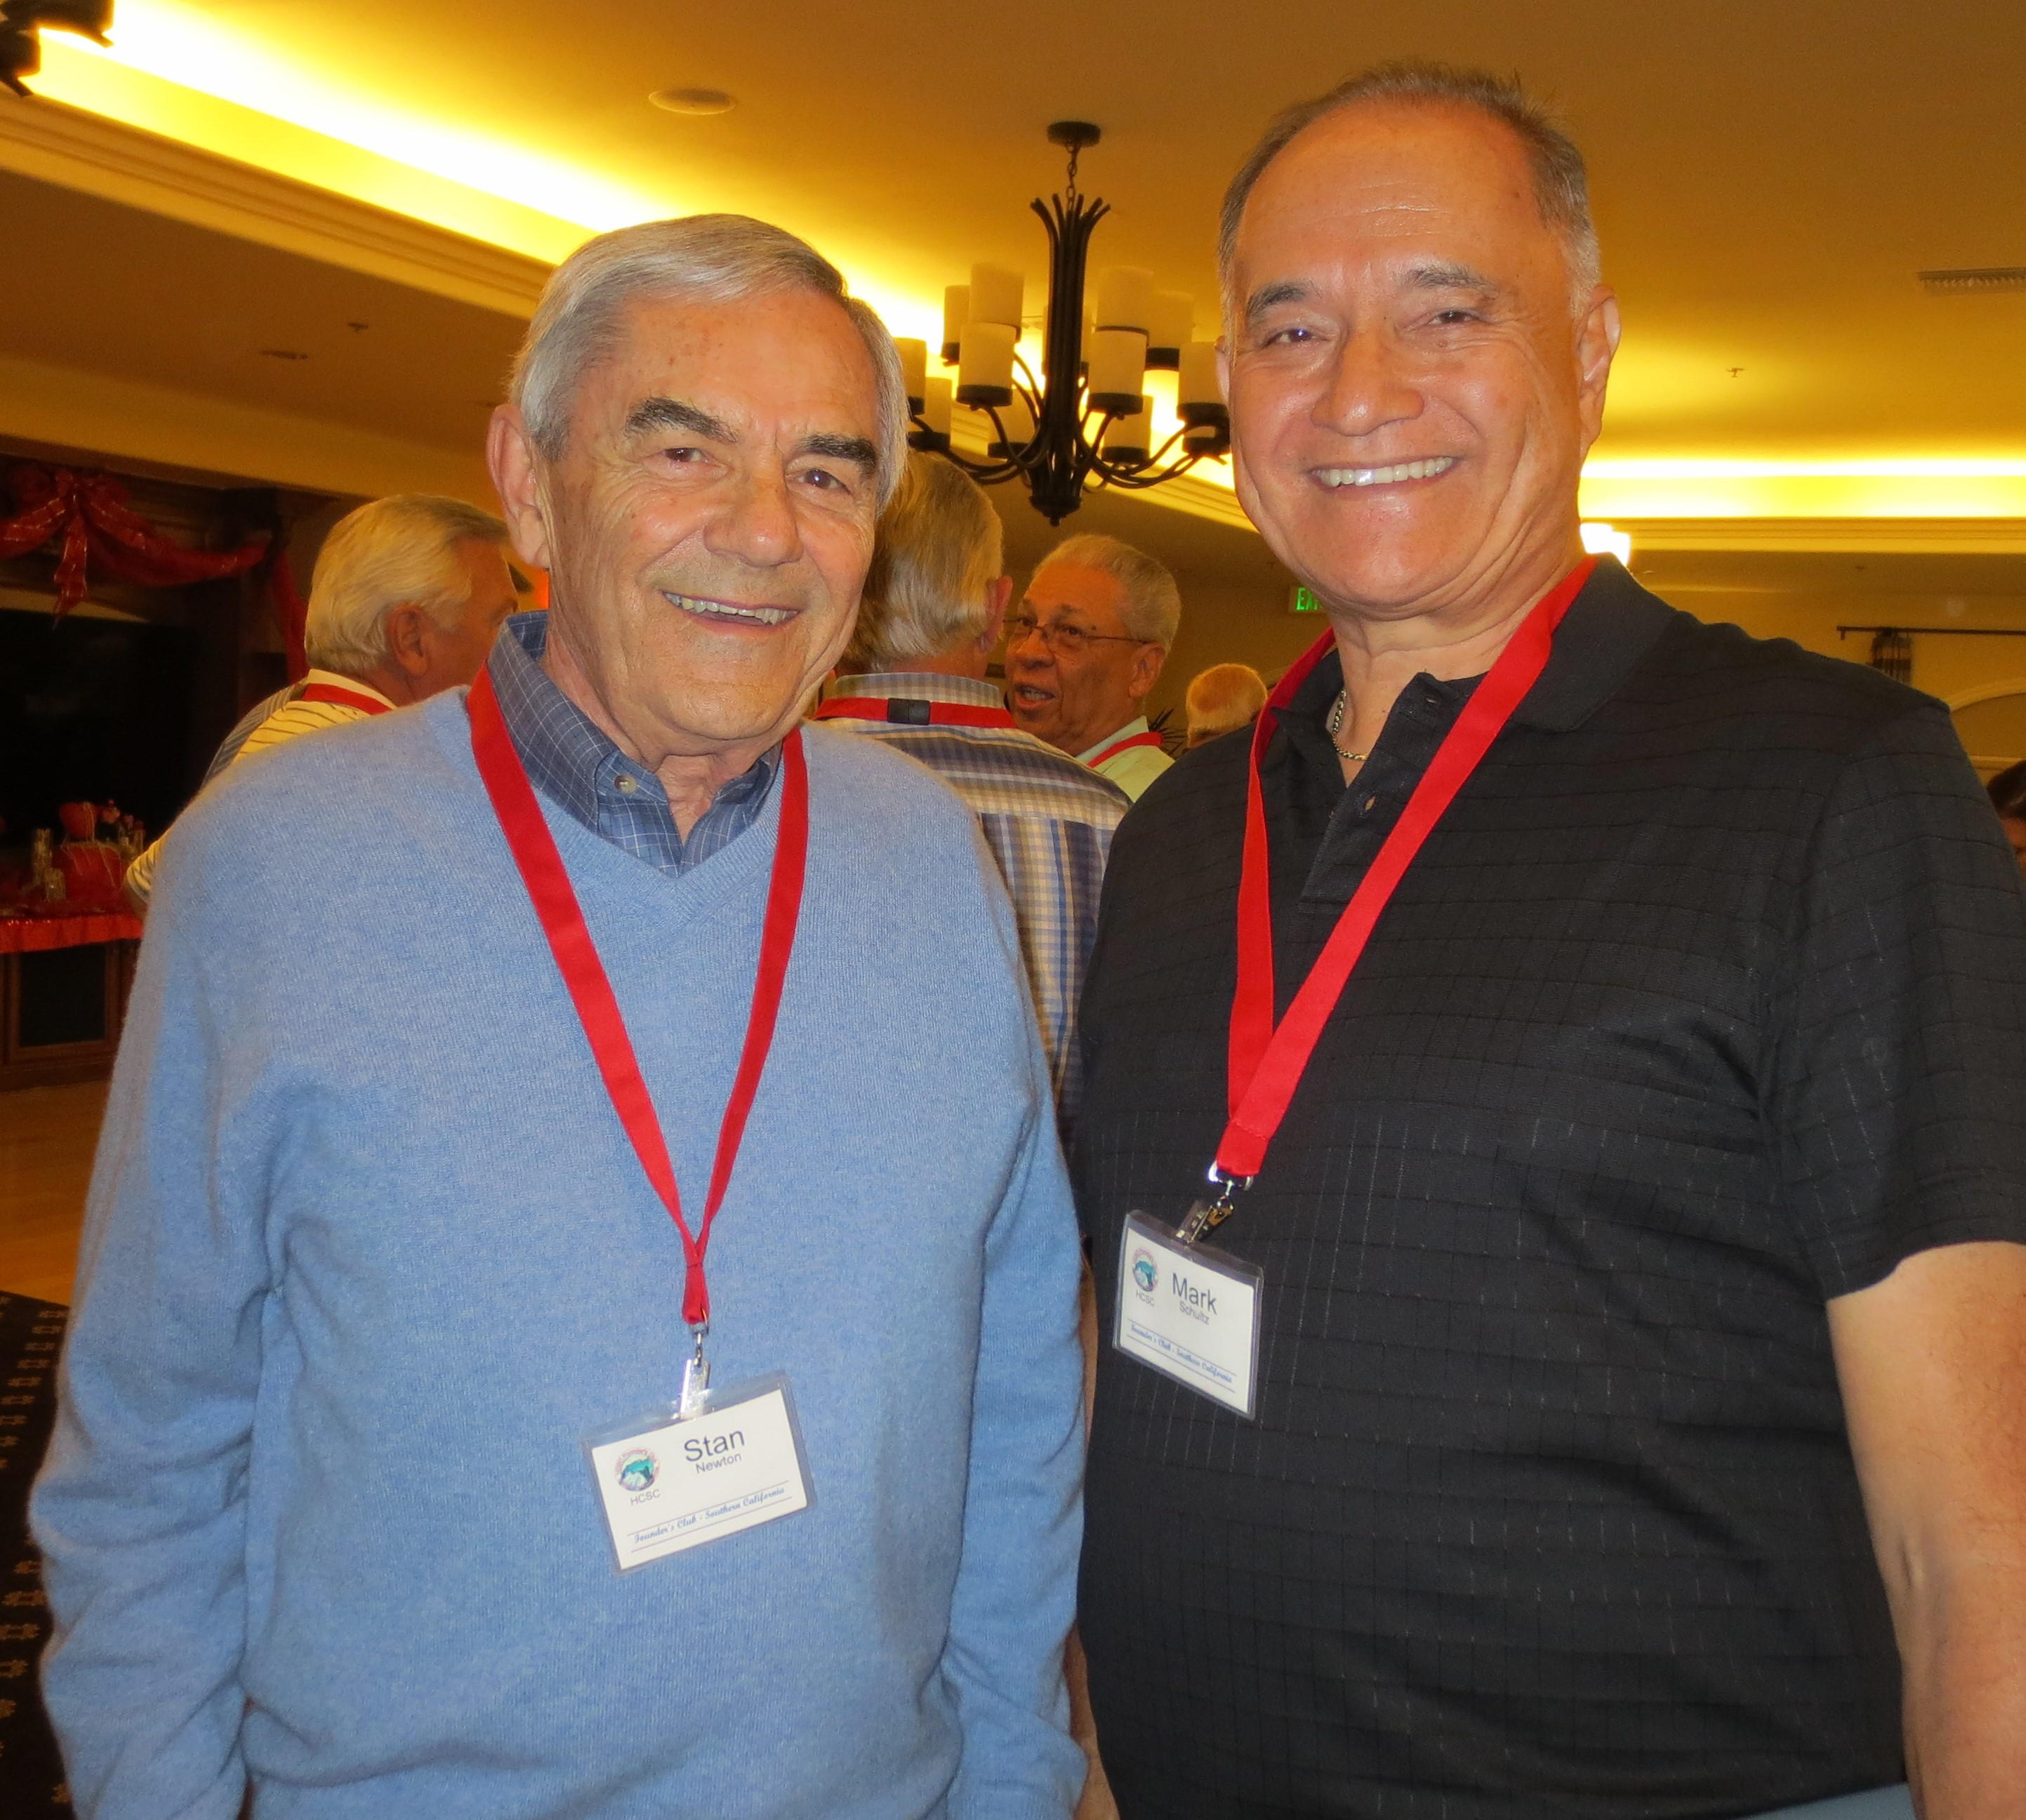 Stan Newton and Mark Schultz